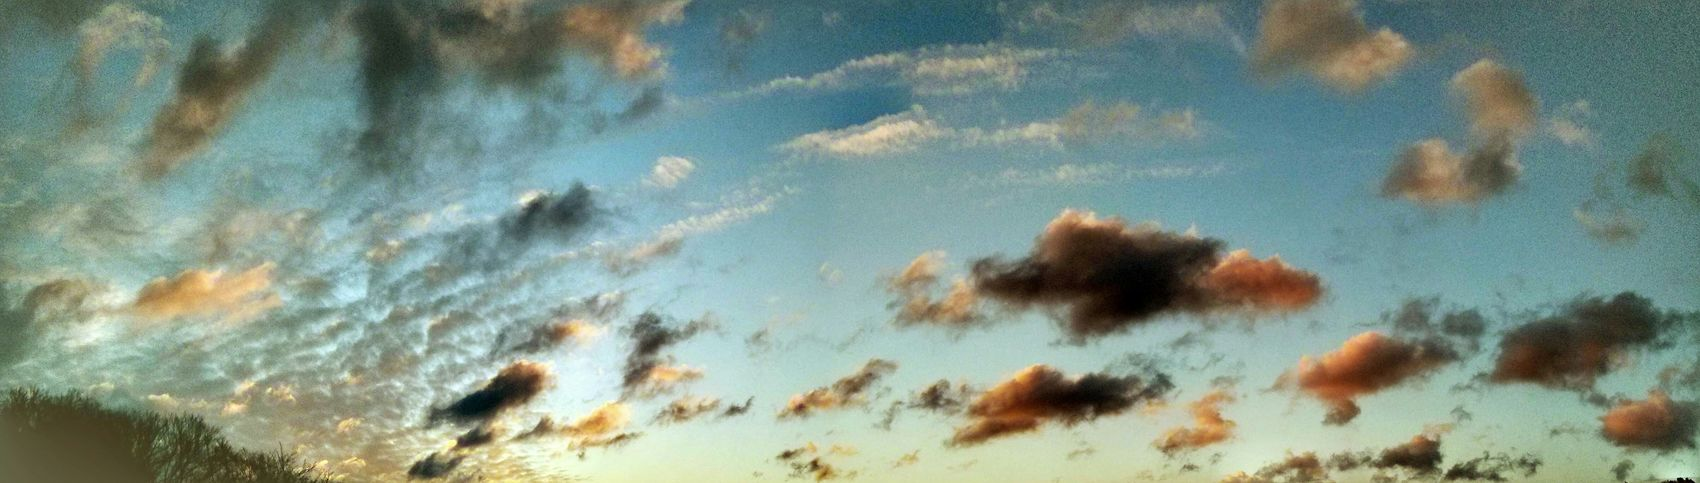 Guten Morgen Banditen Cloudporn Goodmorning Sky